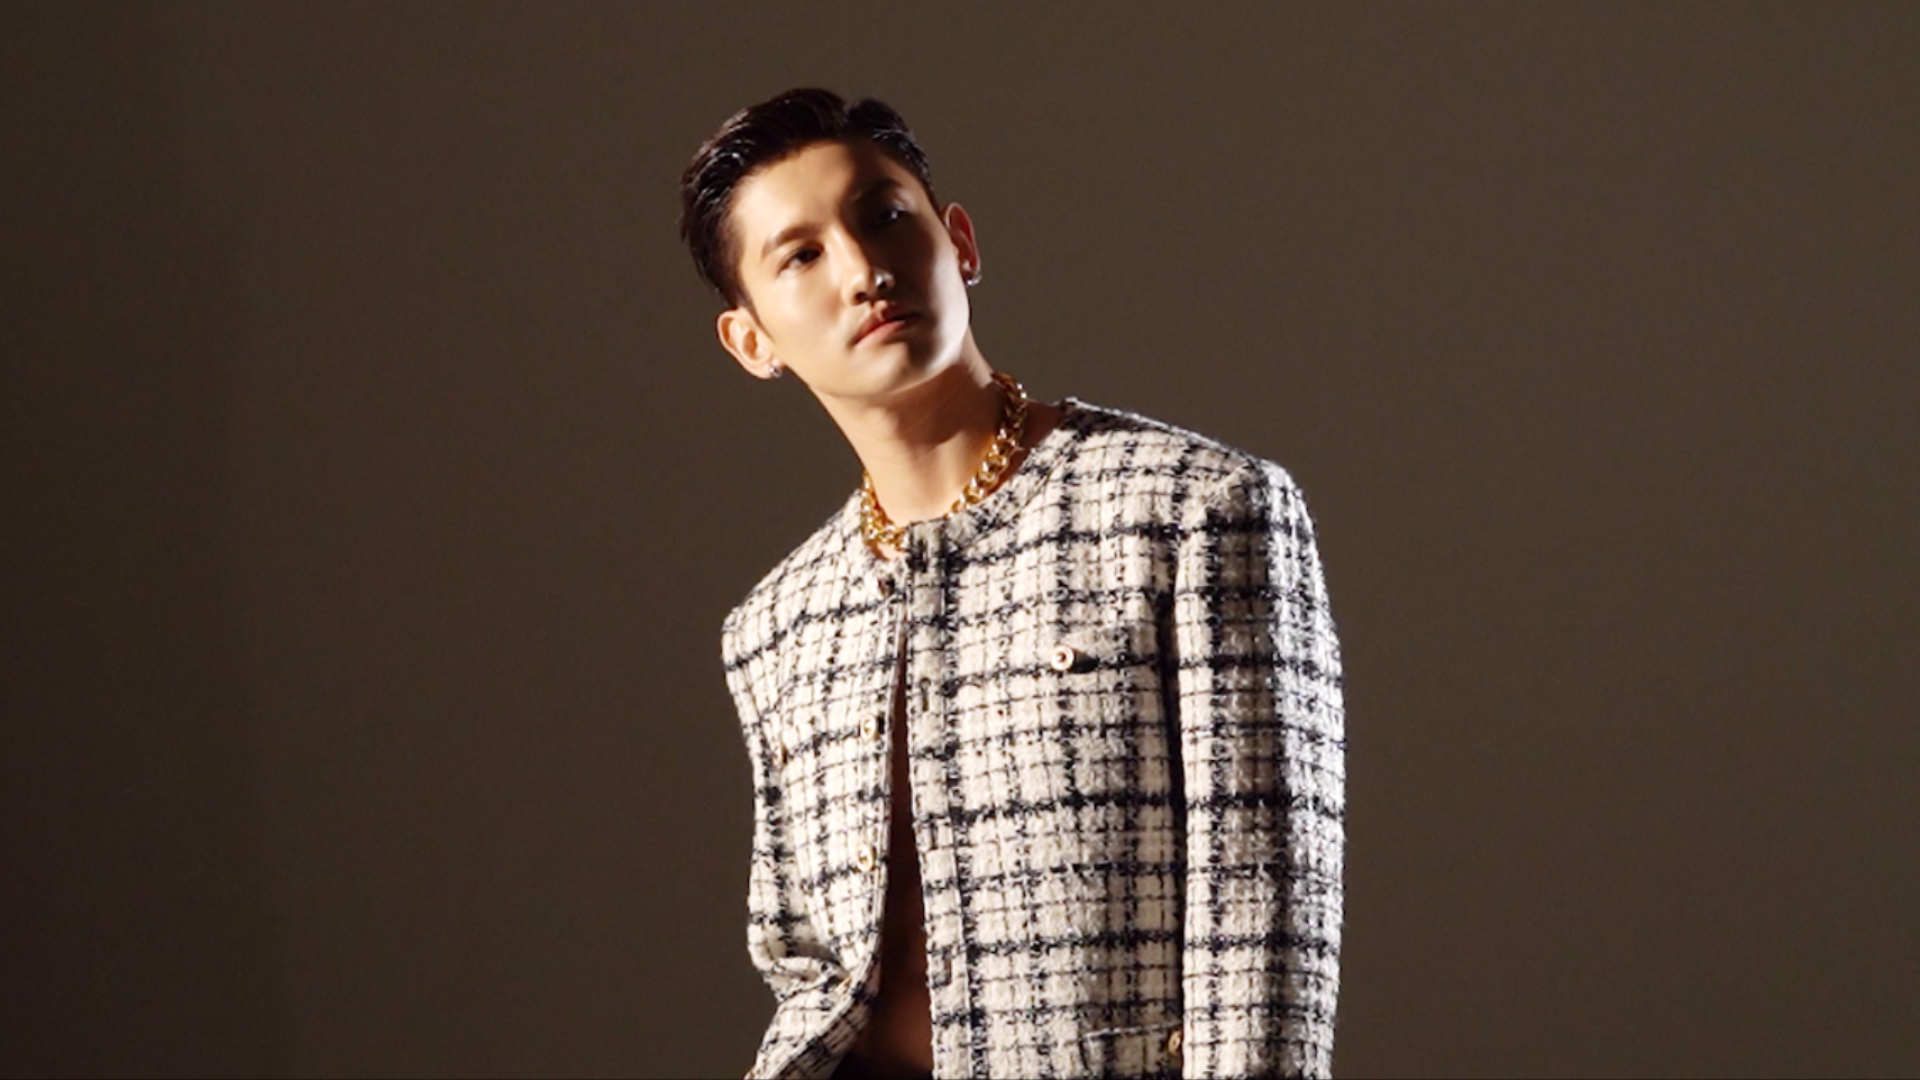 MAX 최강창민 'Chocolate' MV & Jacket Making Film